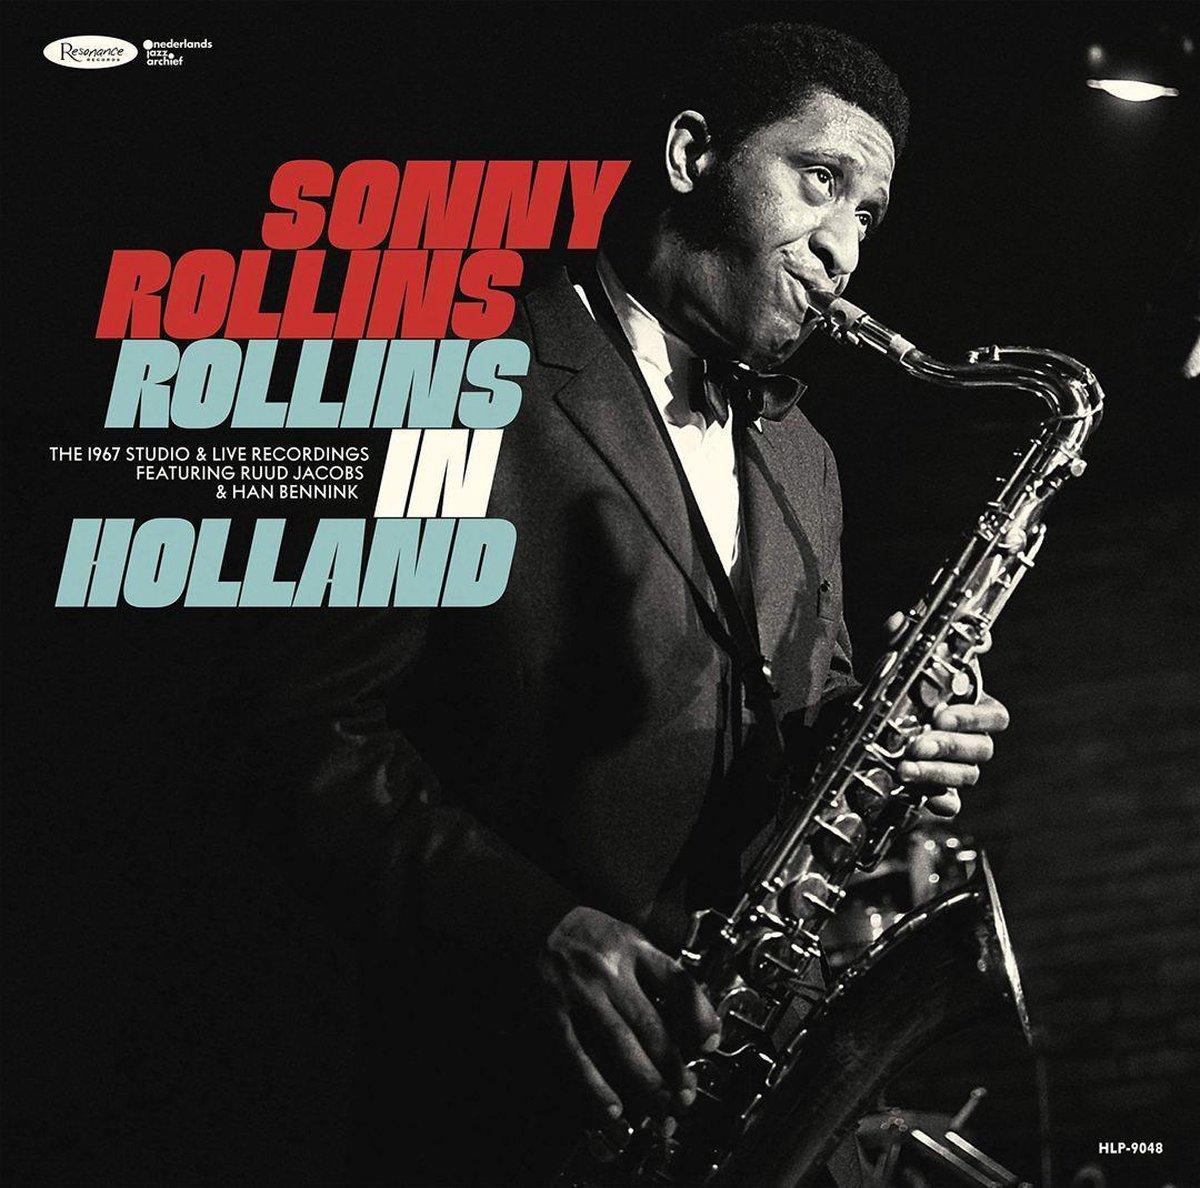 ROLLINS, SONNY - ROLLINS IN HOLLAND